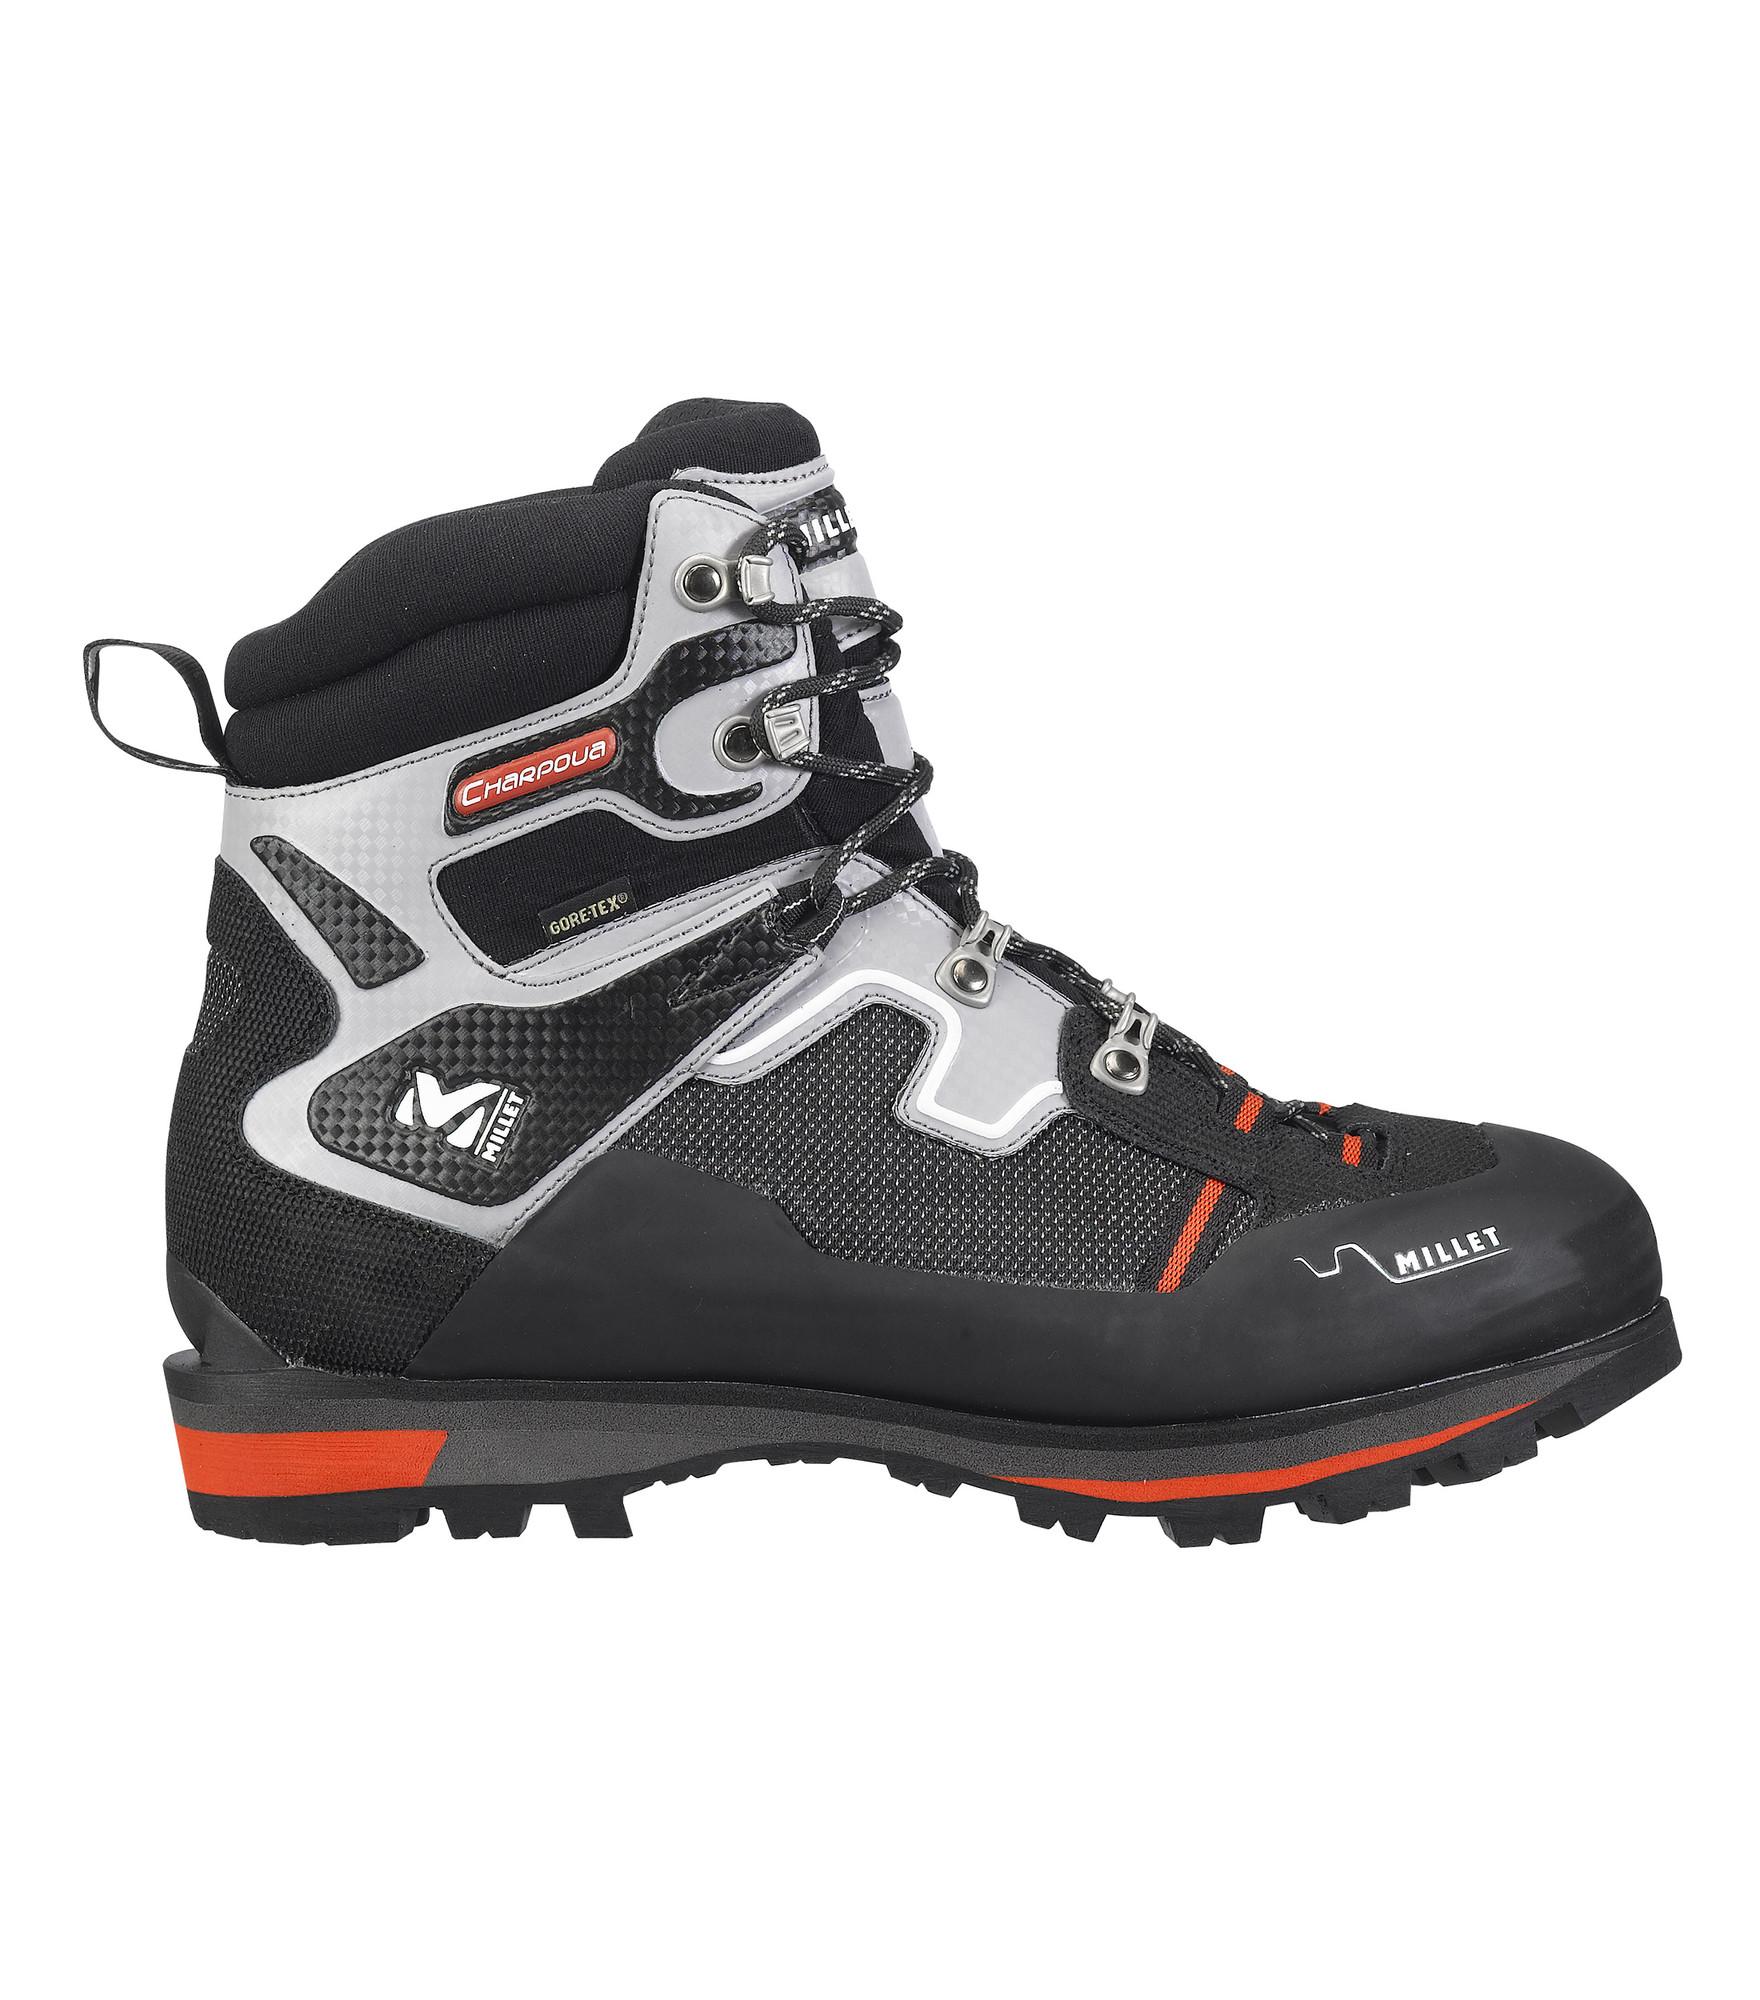 f5945d02e04c Millet Charpoua gtx vysokohorské nepremokavé topánky